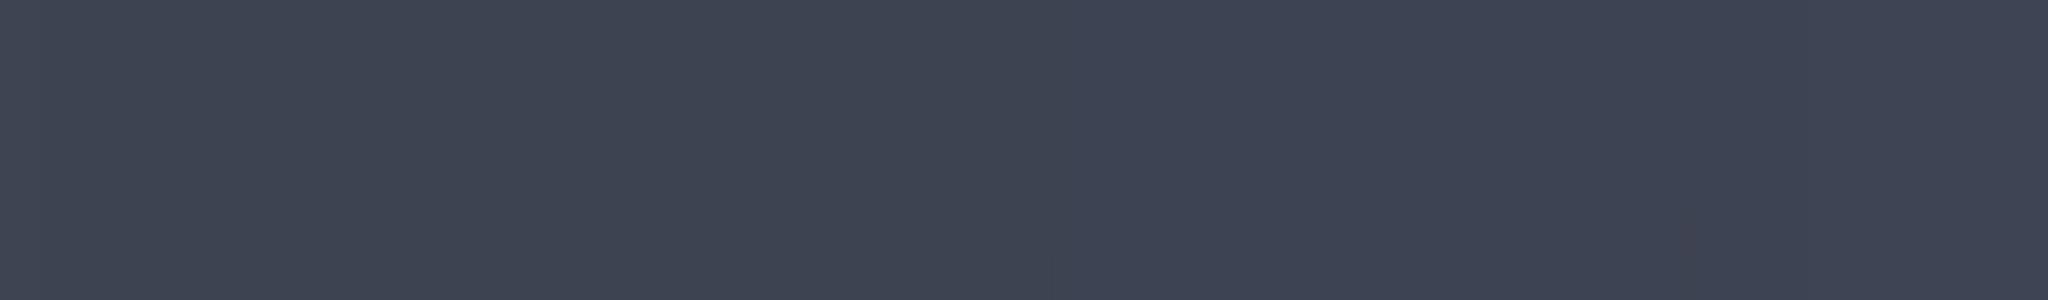 HU 150599 ABS Kante Blau Glatt Matt